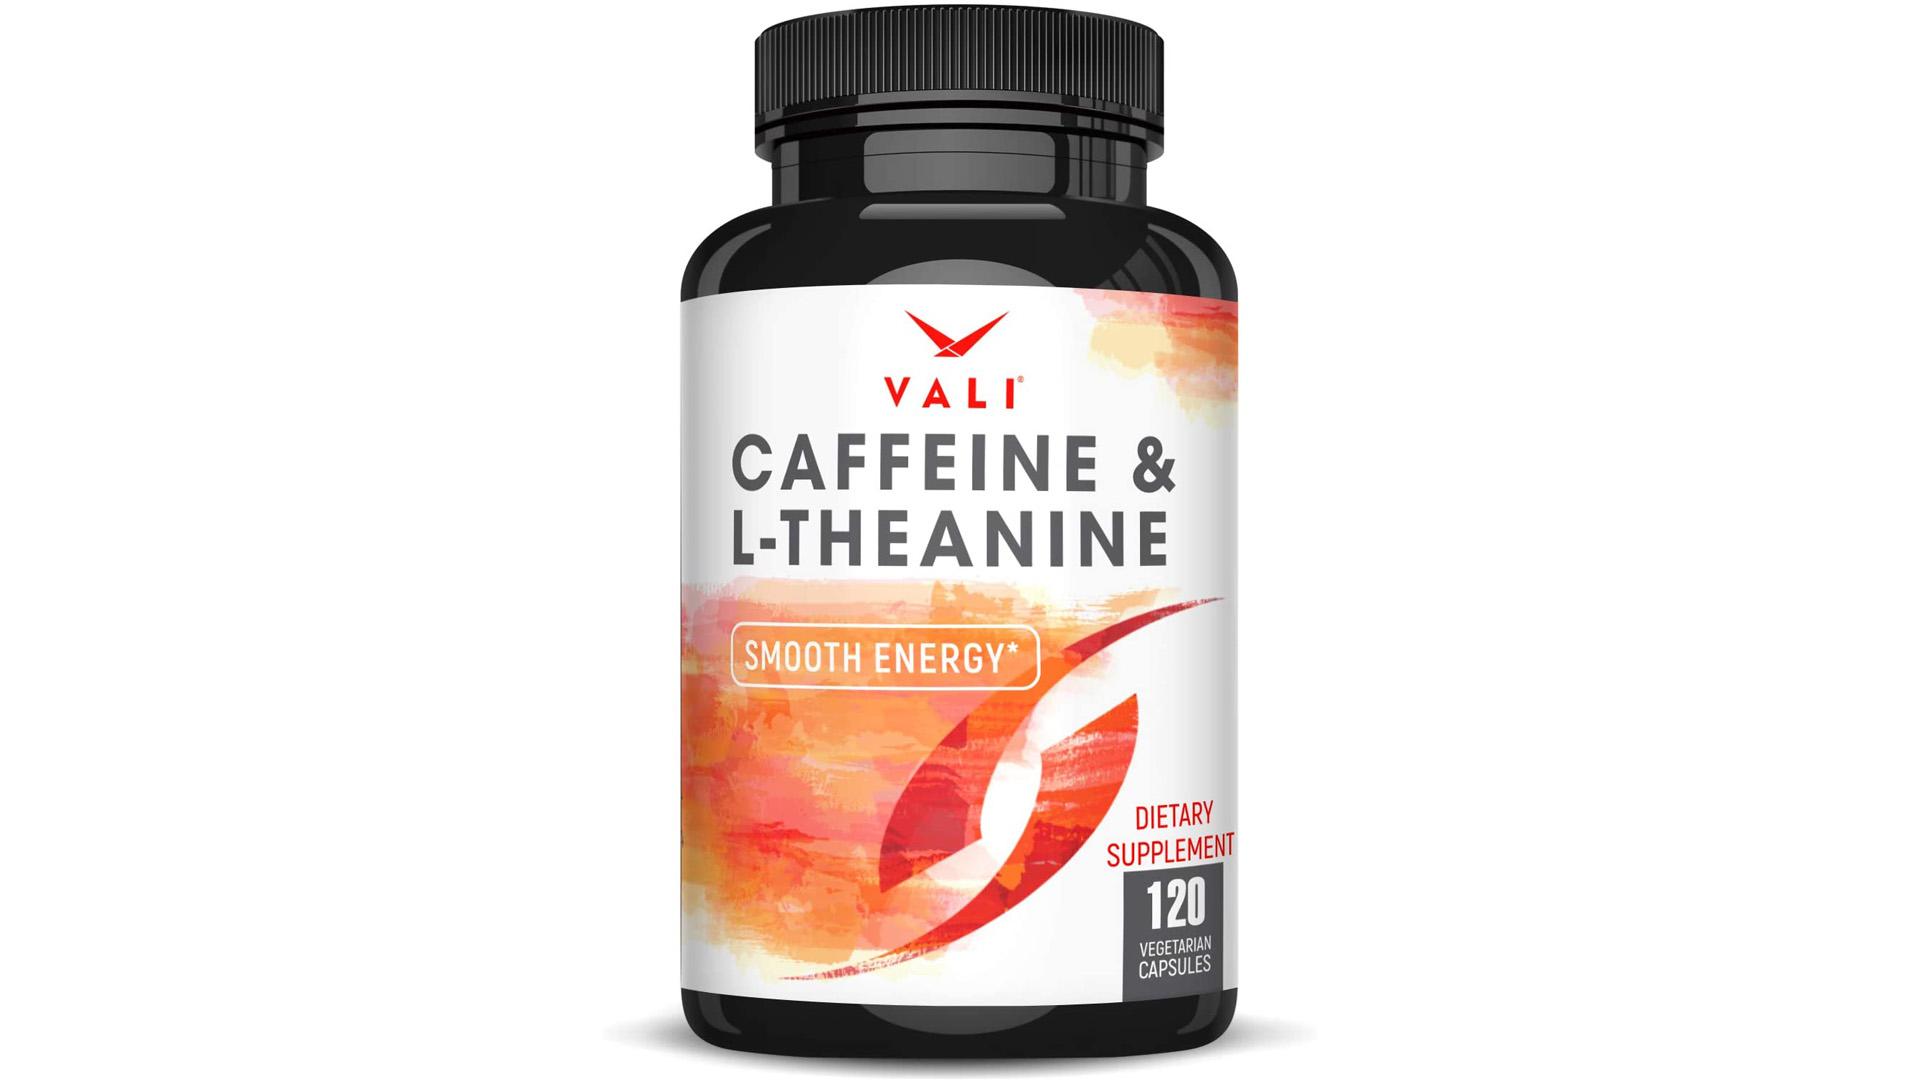 Vali Caffeine & L-Theanine